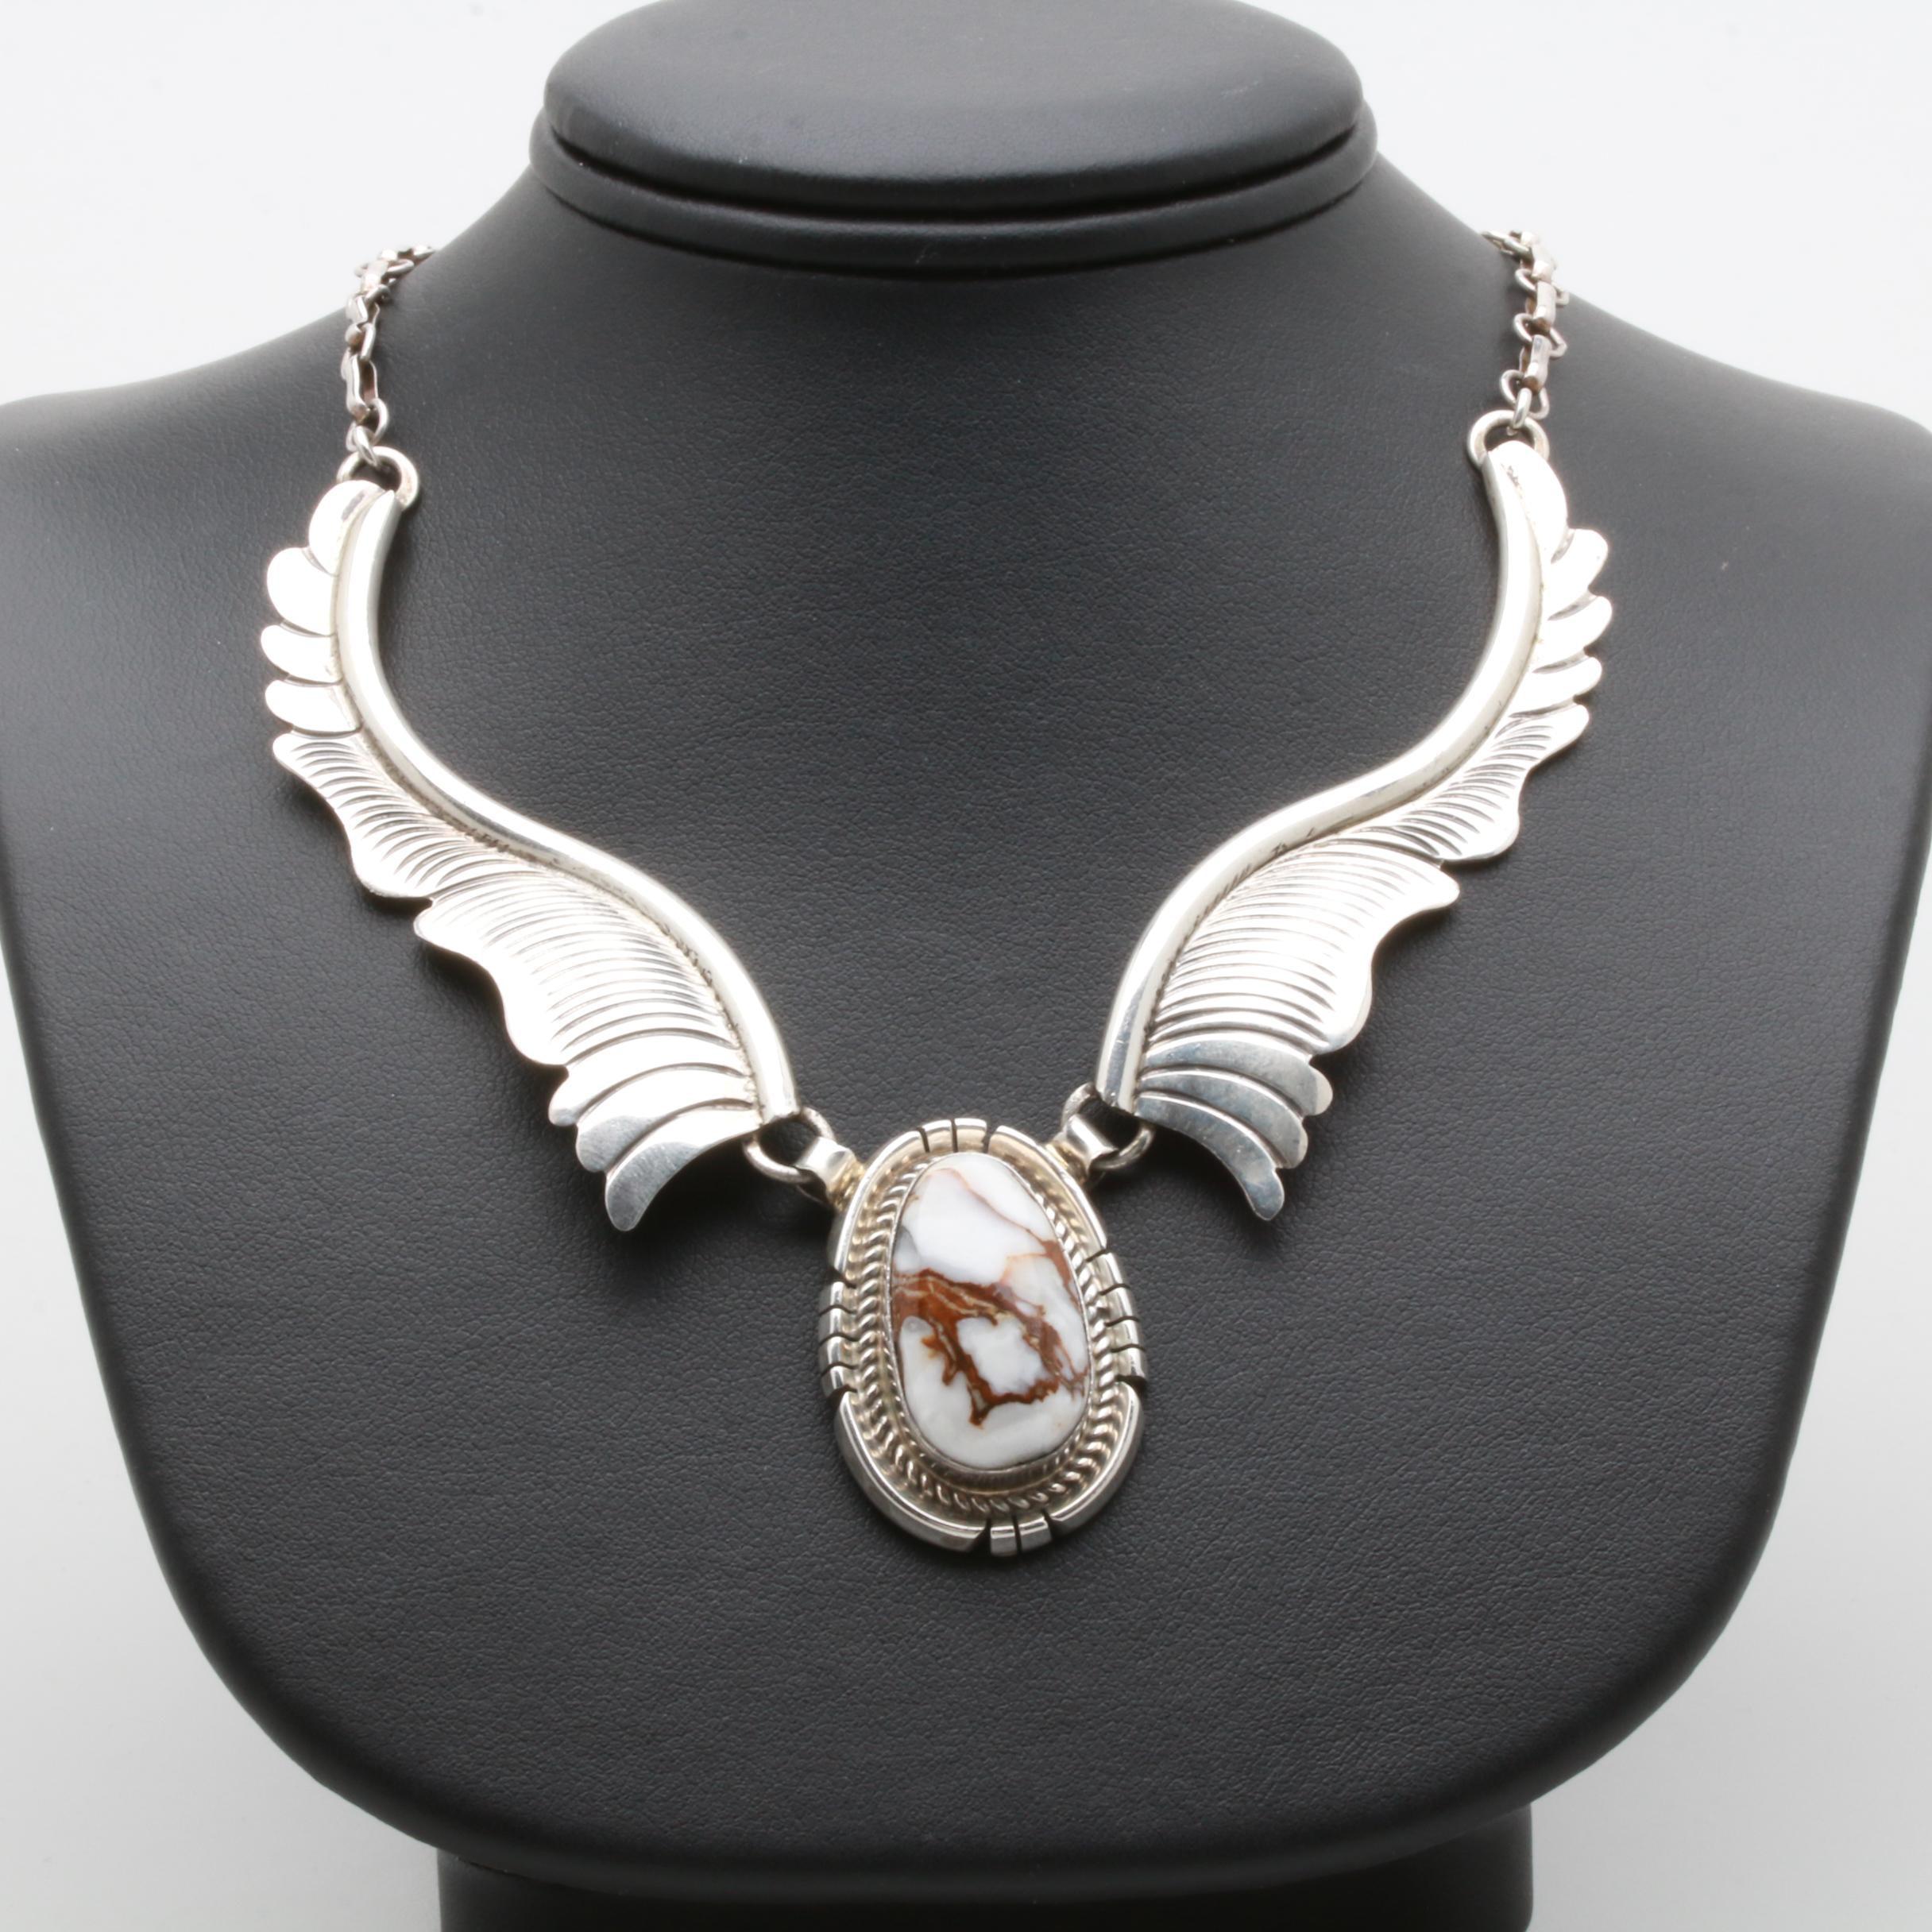 James W Toadlena Navajo Diné Sterling Silver Agate Necklace